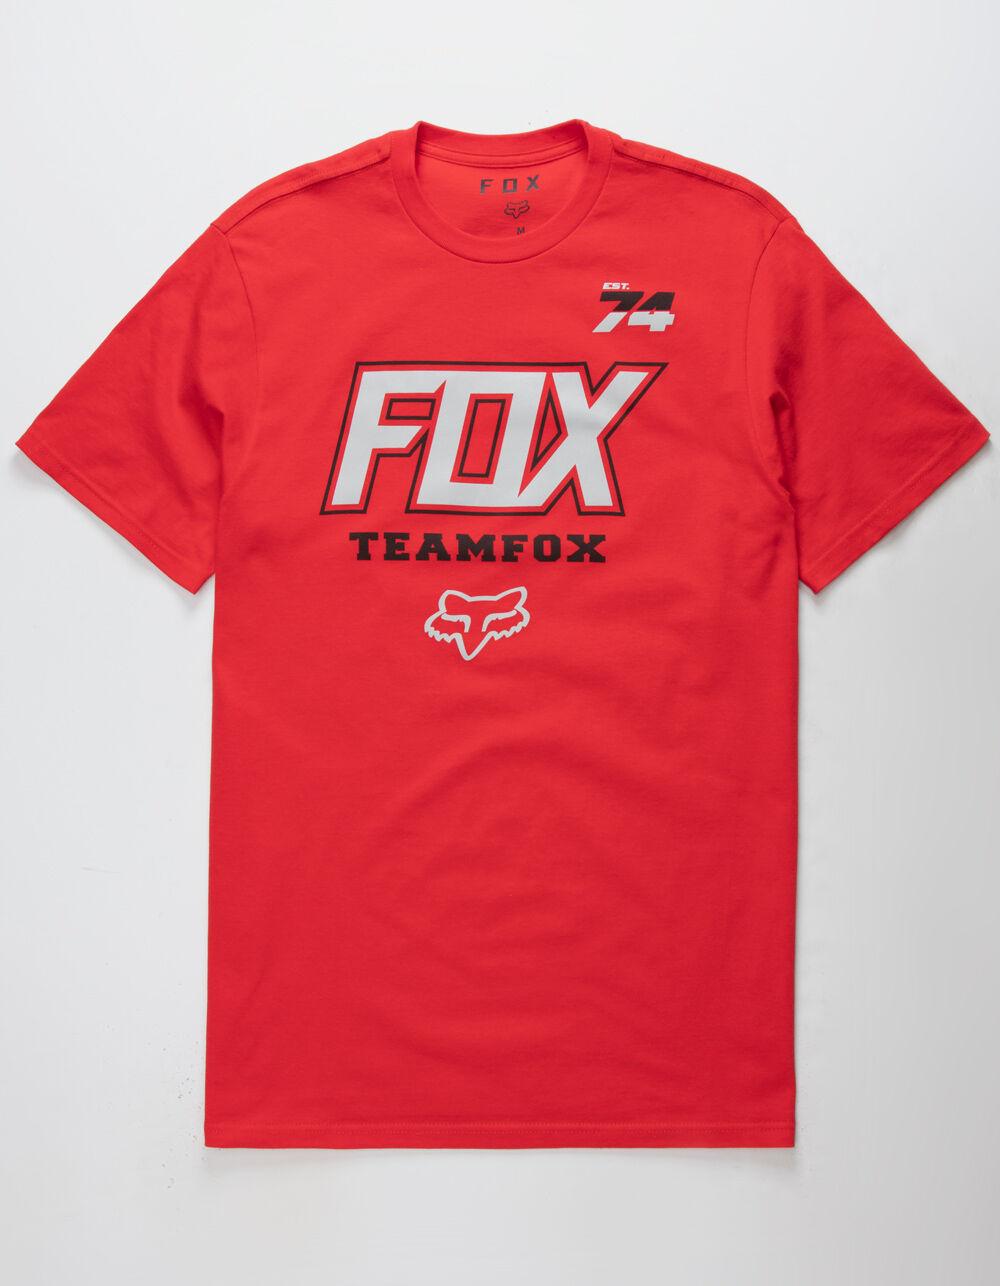 FOX Team Fox Red T-Shirt